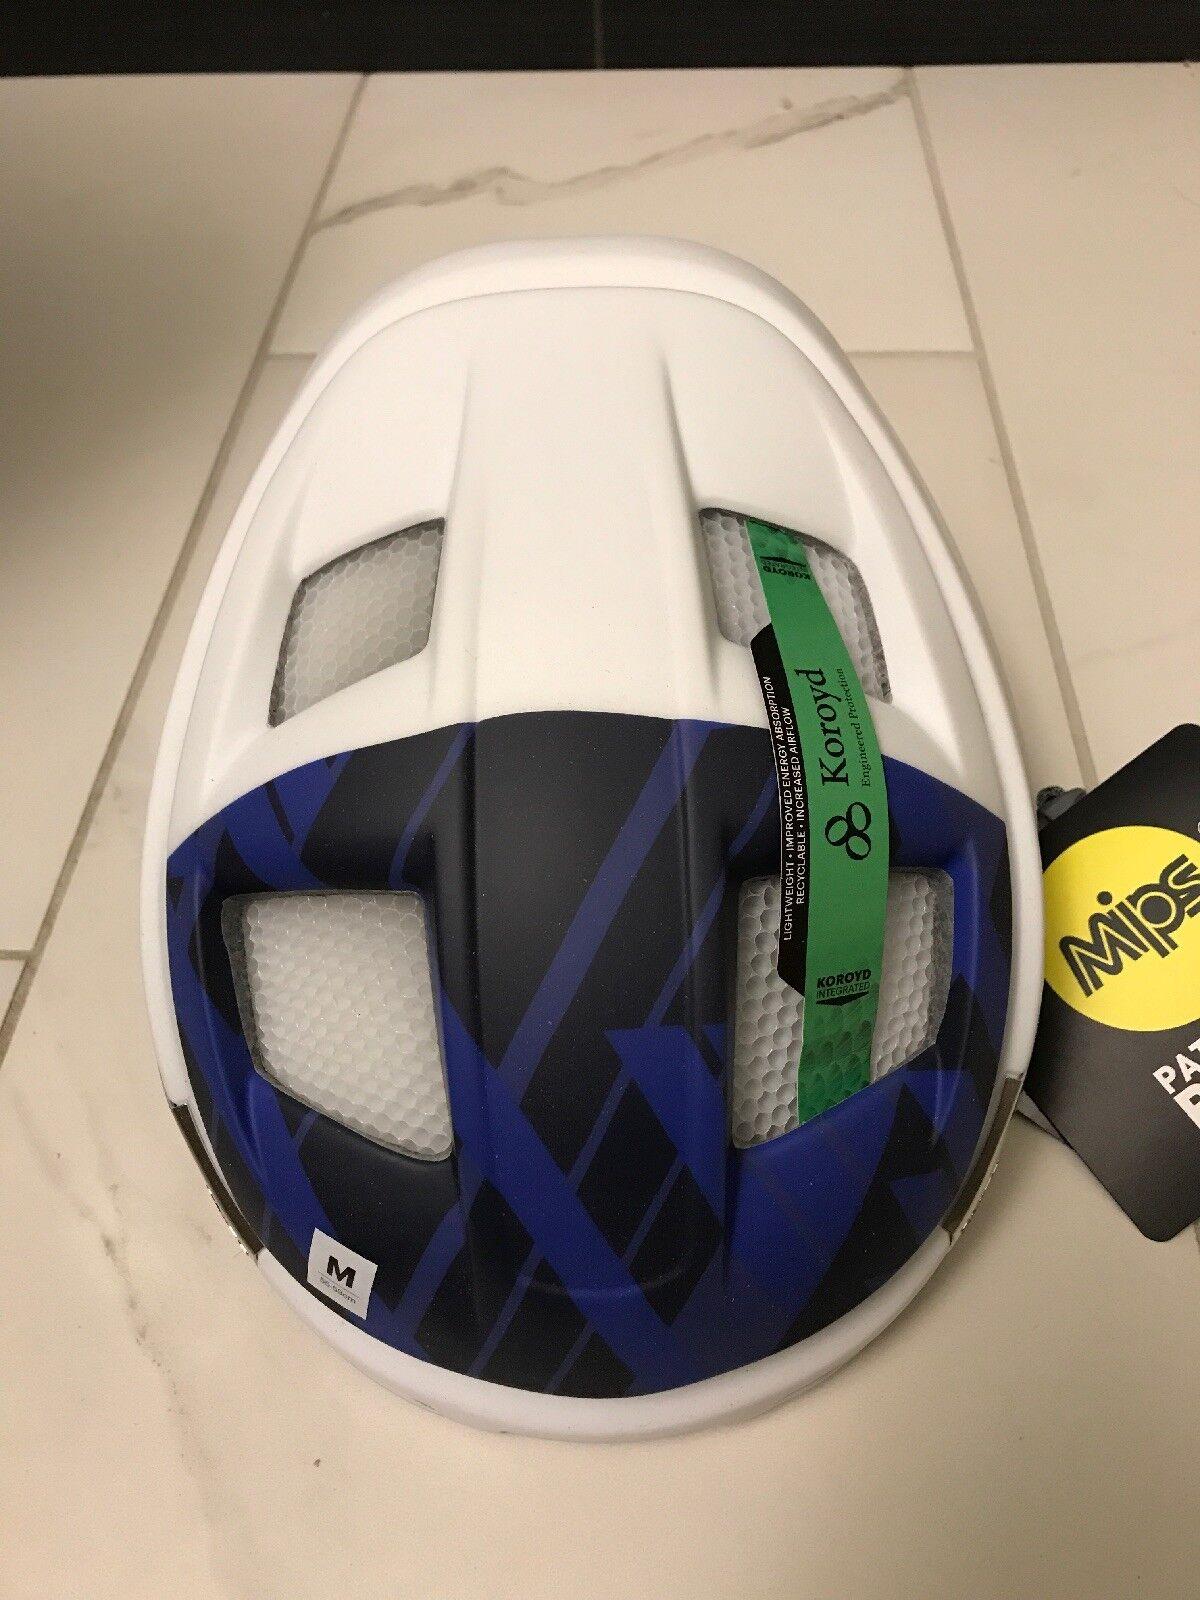 Smith Optics Ogreenake UHC Pro Cycling Road Bike Cycling Helmet NEW Medium